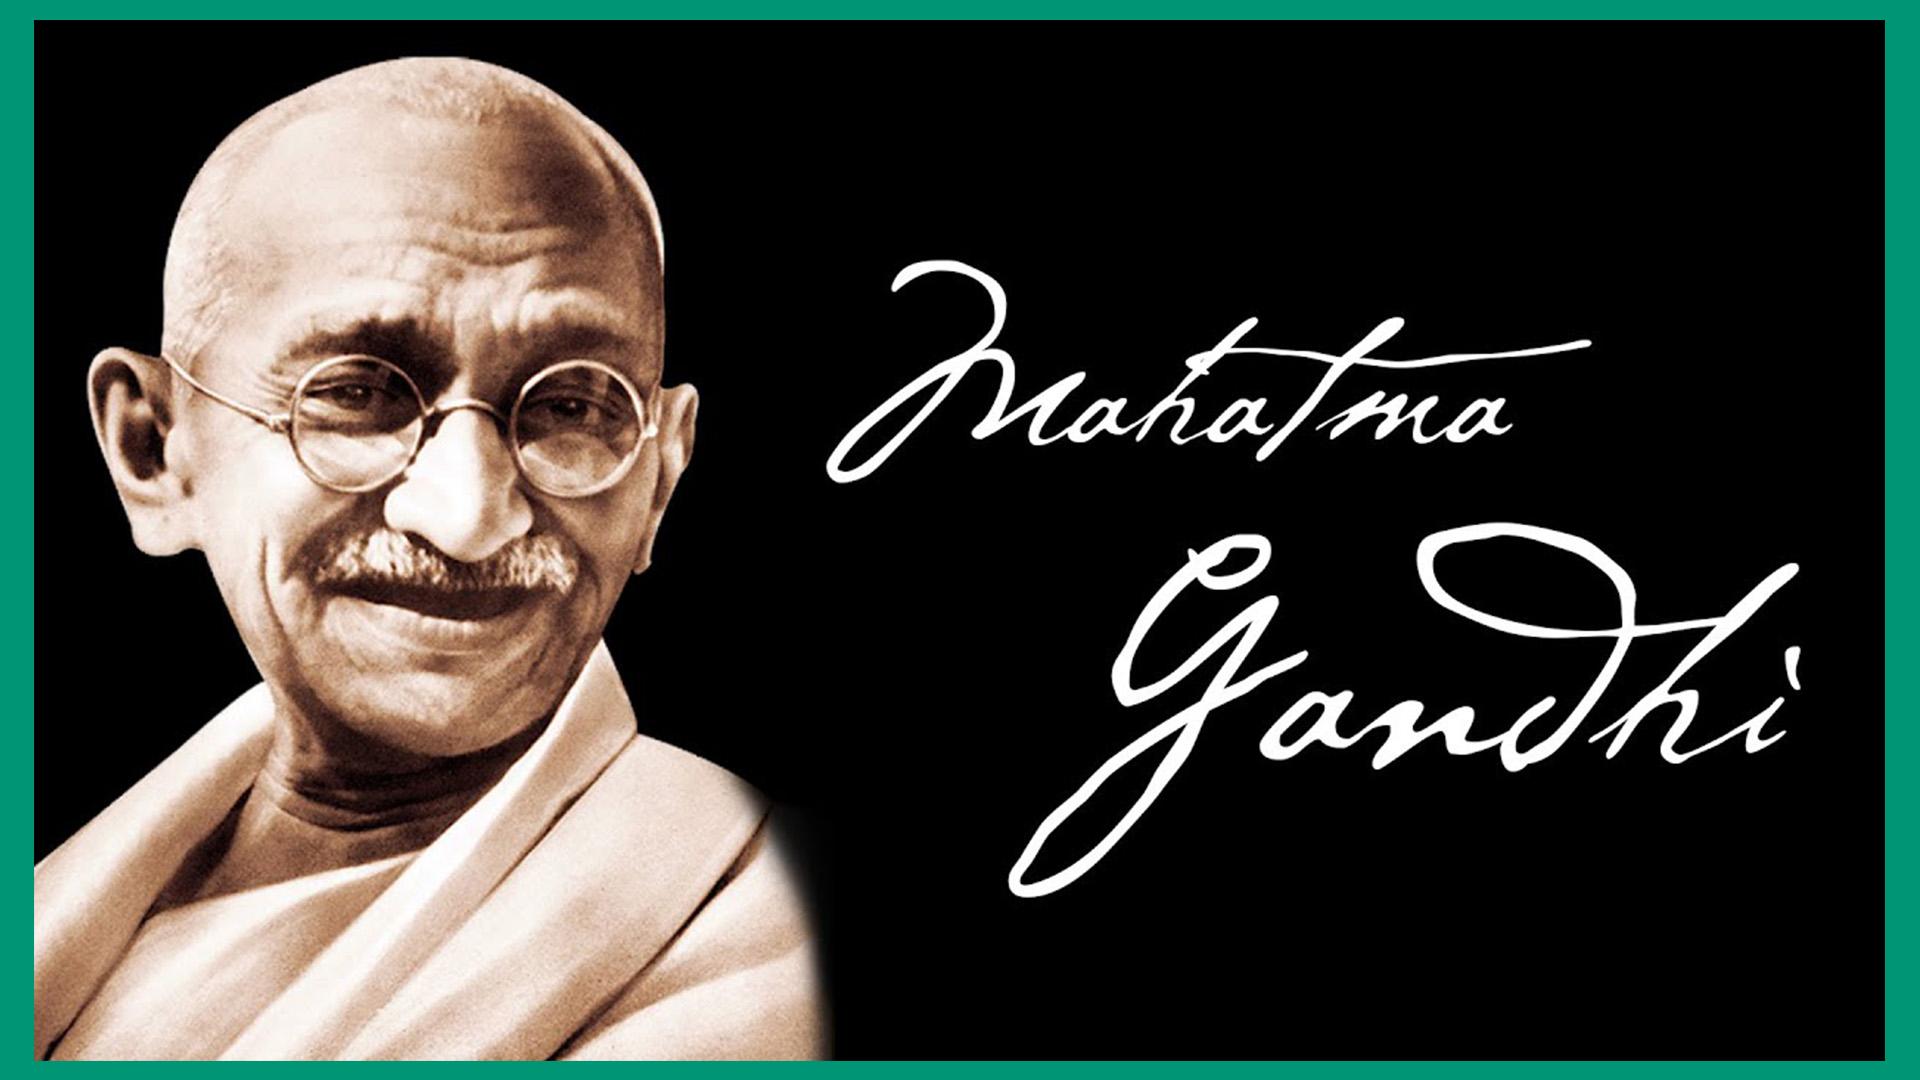 Životne Mudrosti 6 (Mahatma Gandhi)